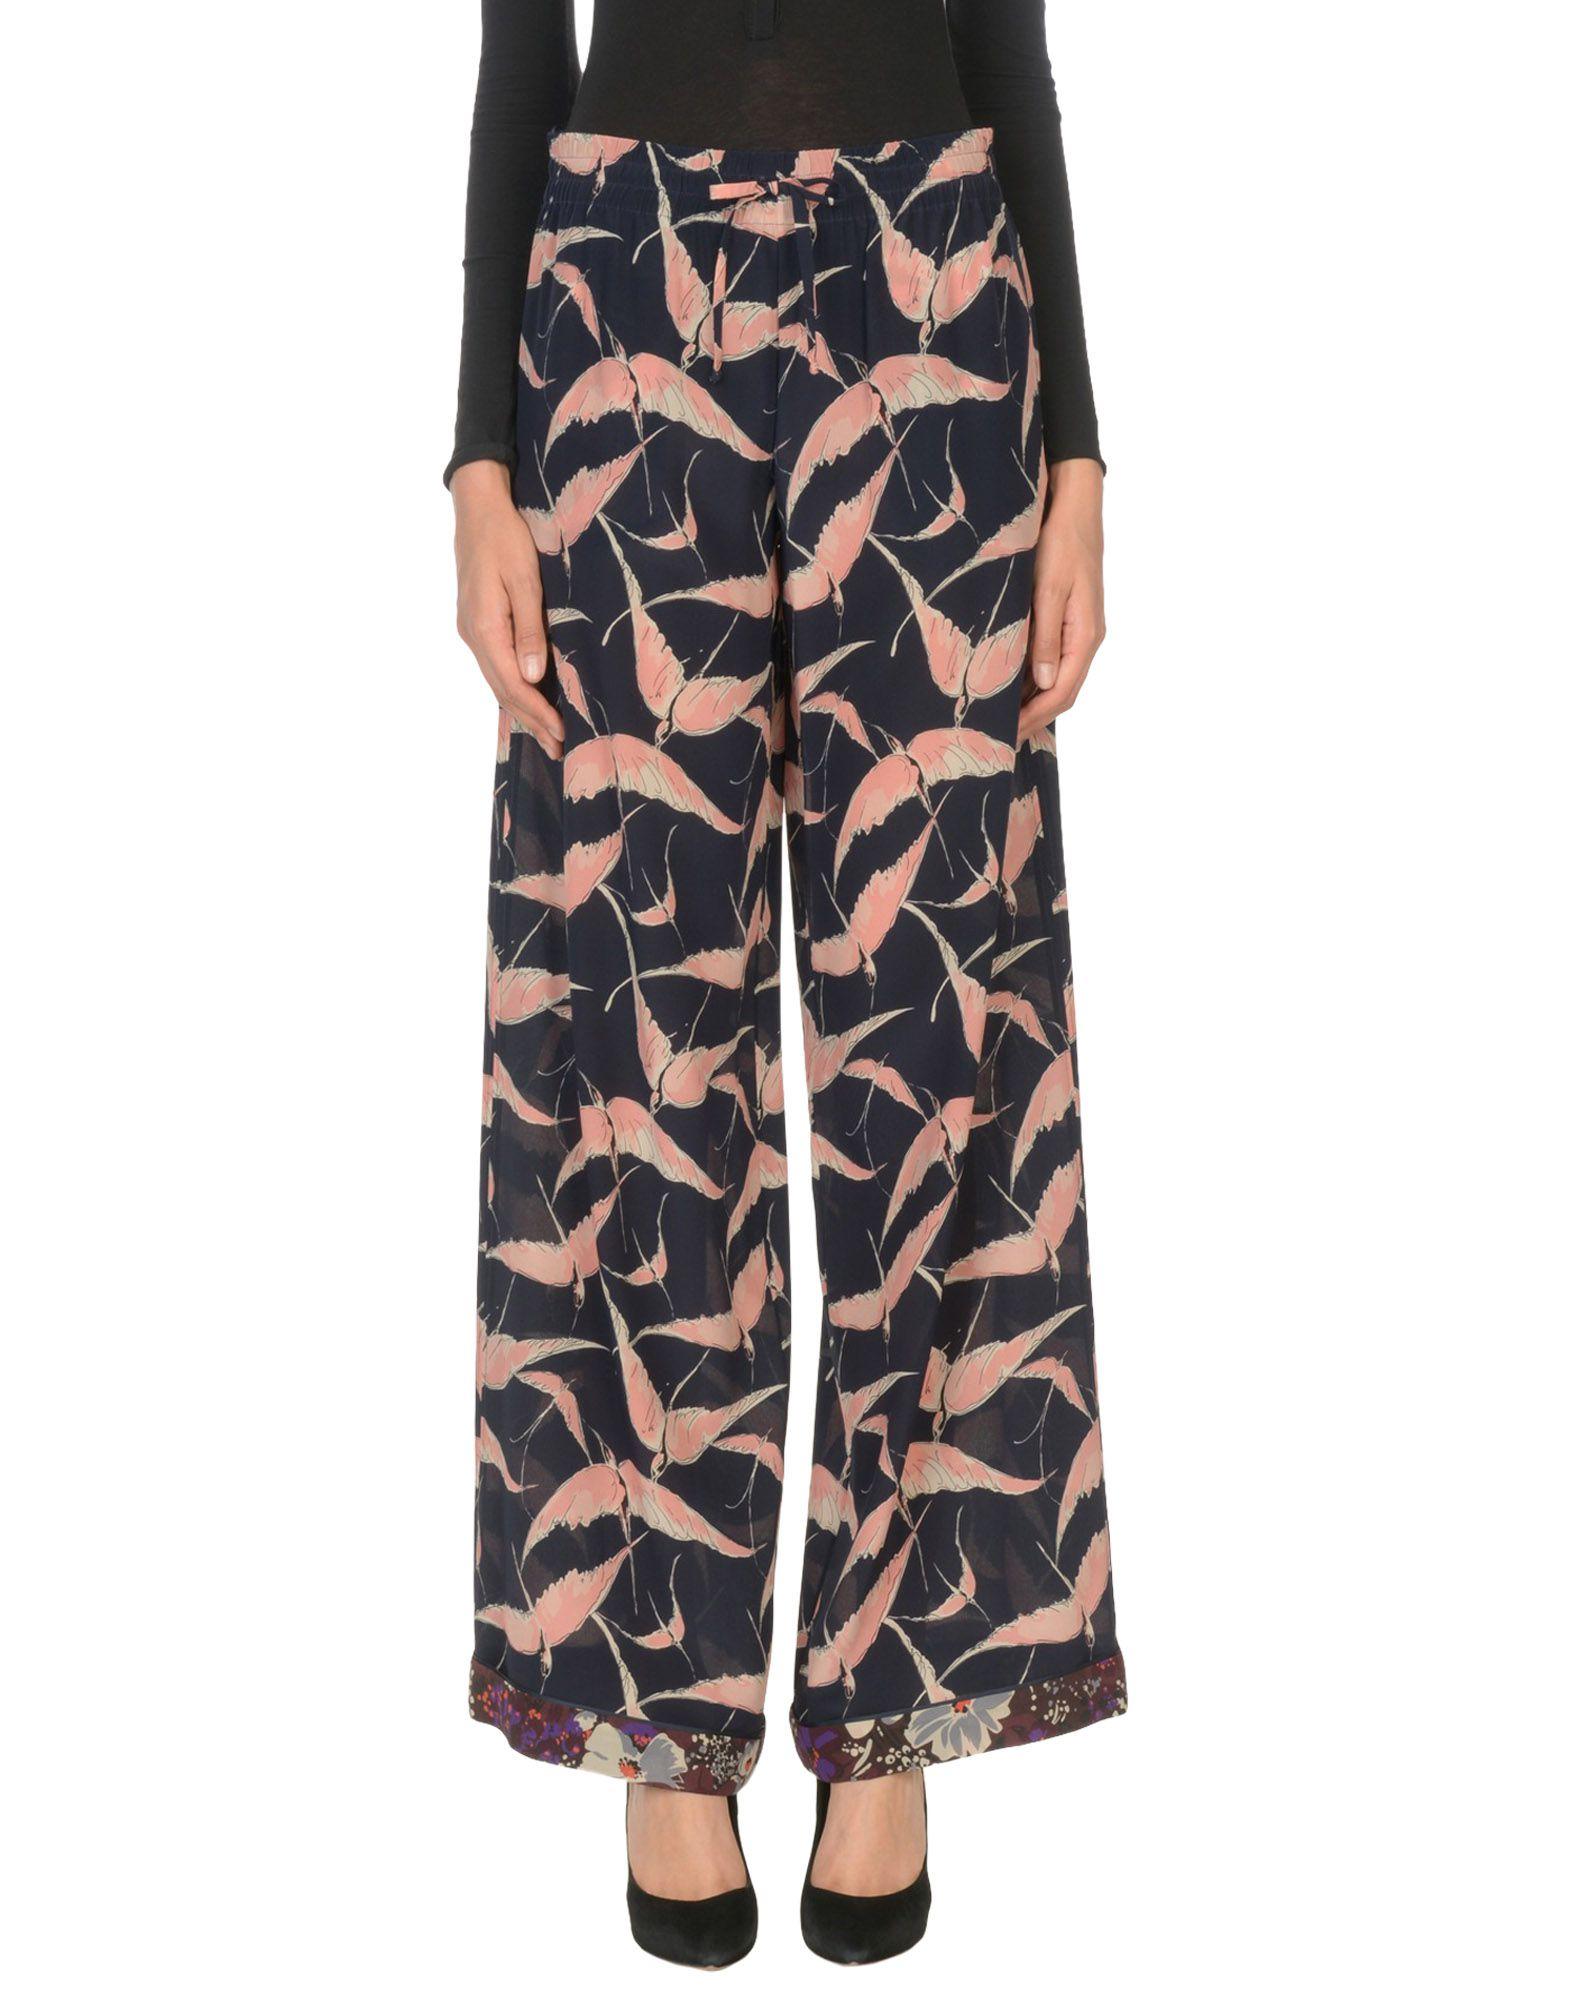 Pantalone Valentino donna donna donna - 13157292MM a03